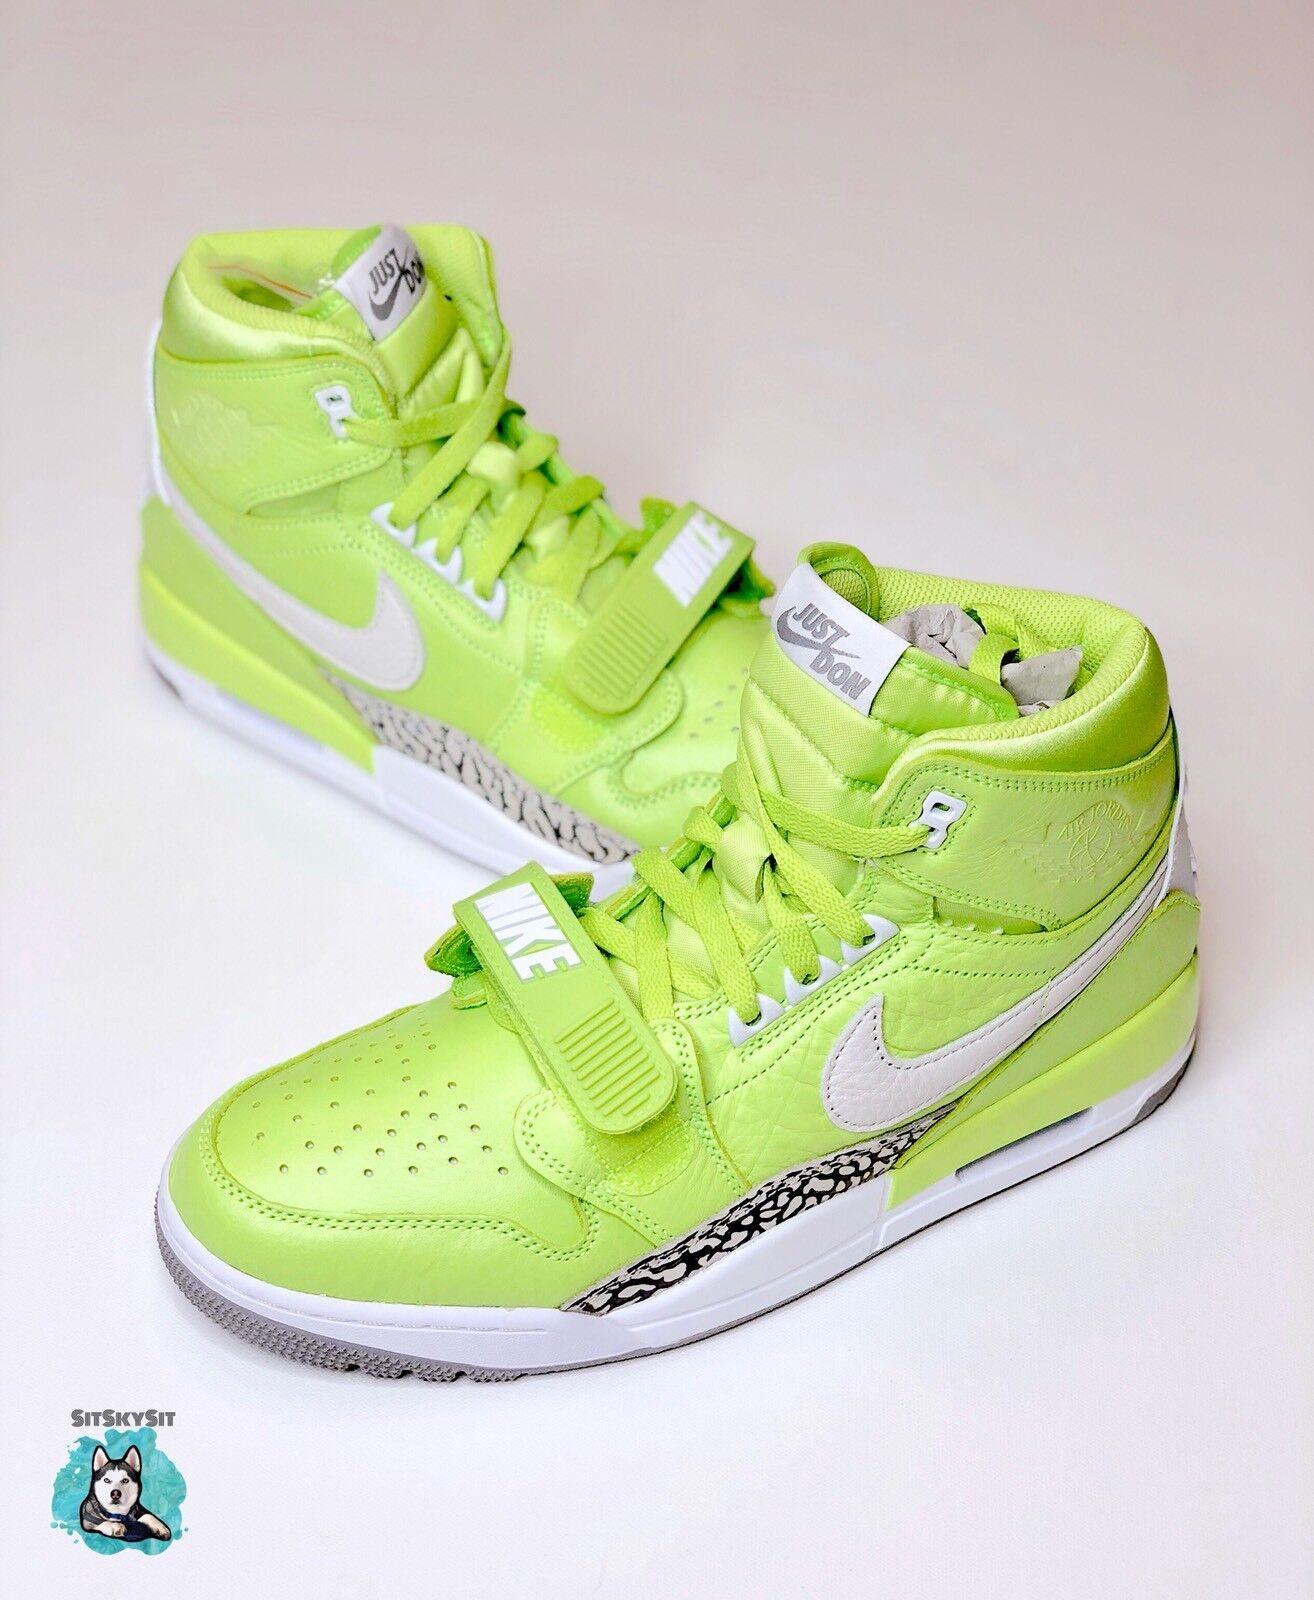 Nike Air Jordan Legacy 312 NRG (AQ4160-301) Size 10.5